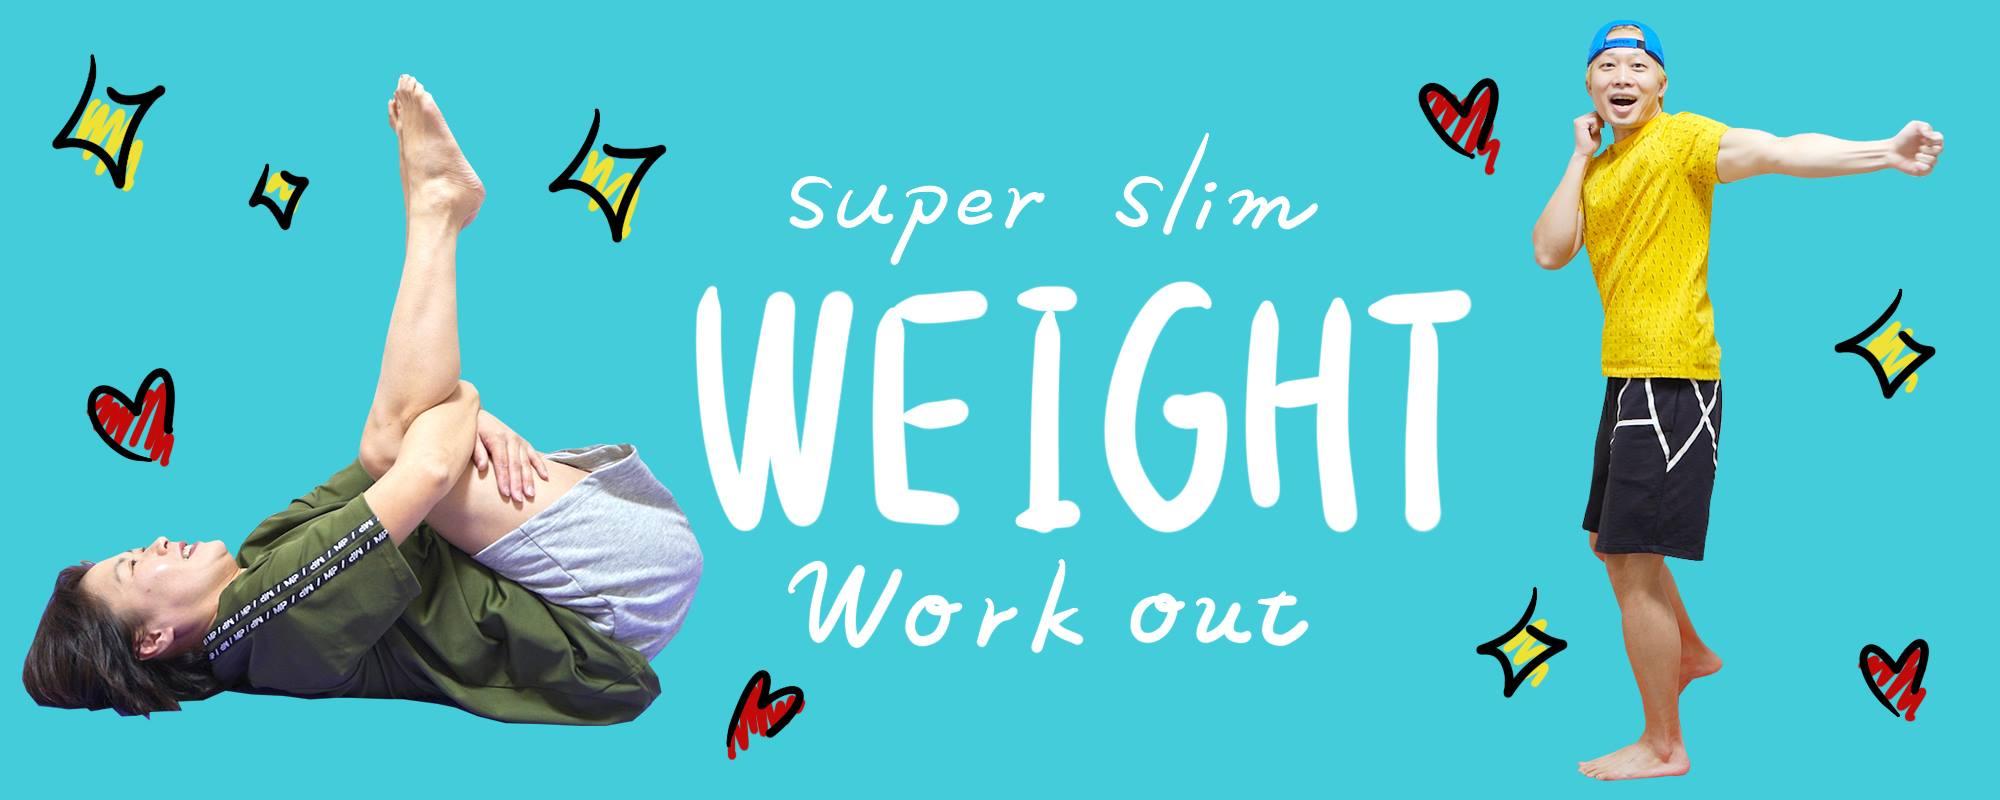 Lose weight 4 weeks program